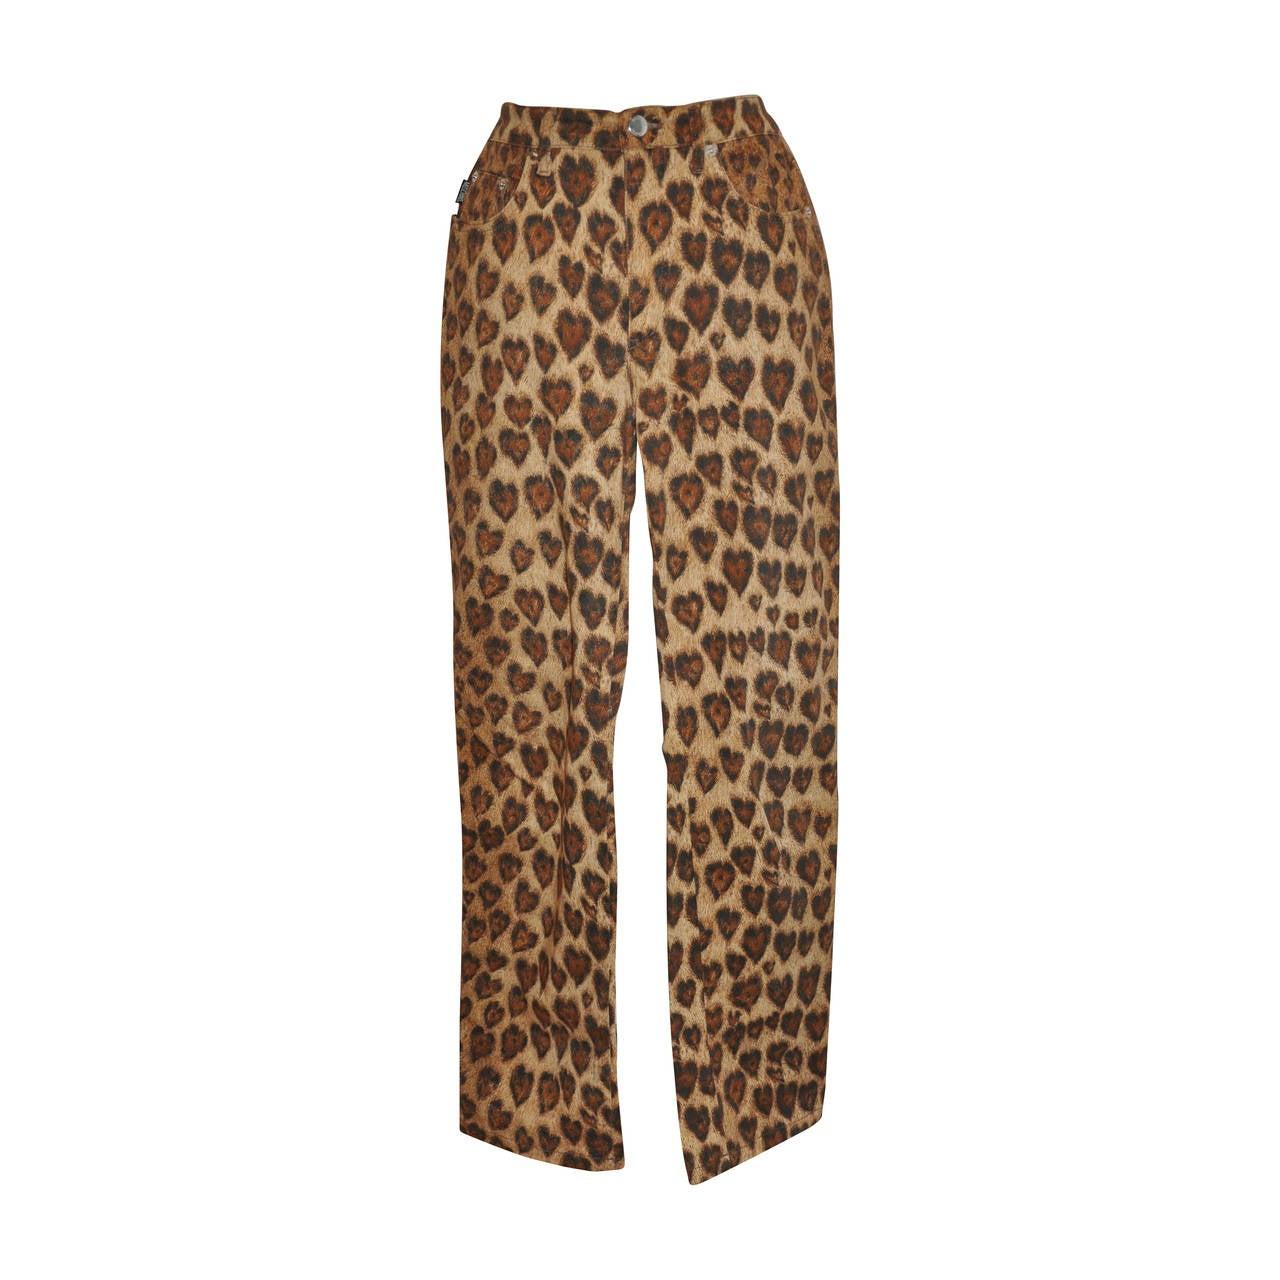 Moschino Leopard Print Five-Pocket Stretch Cotton Pants 1